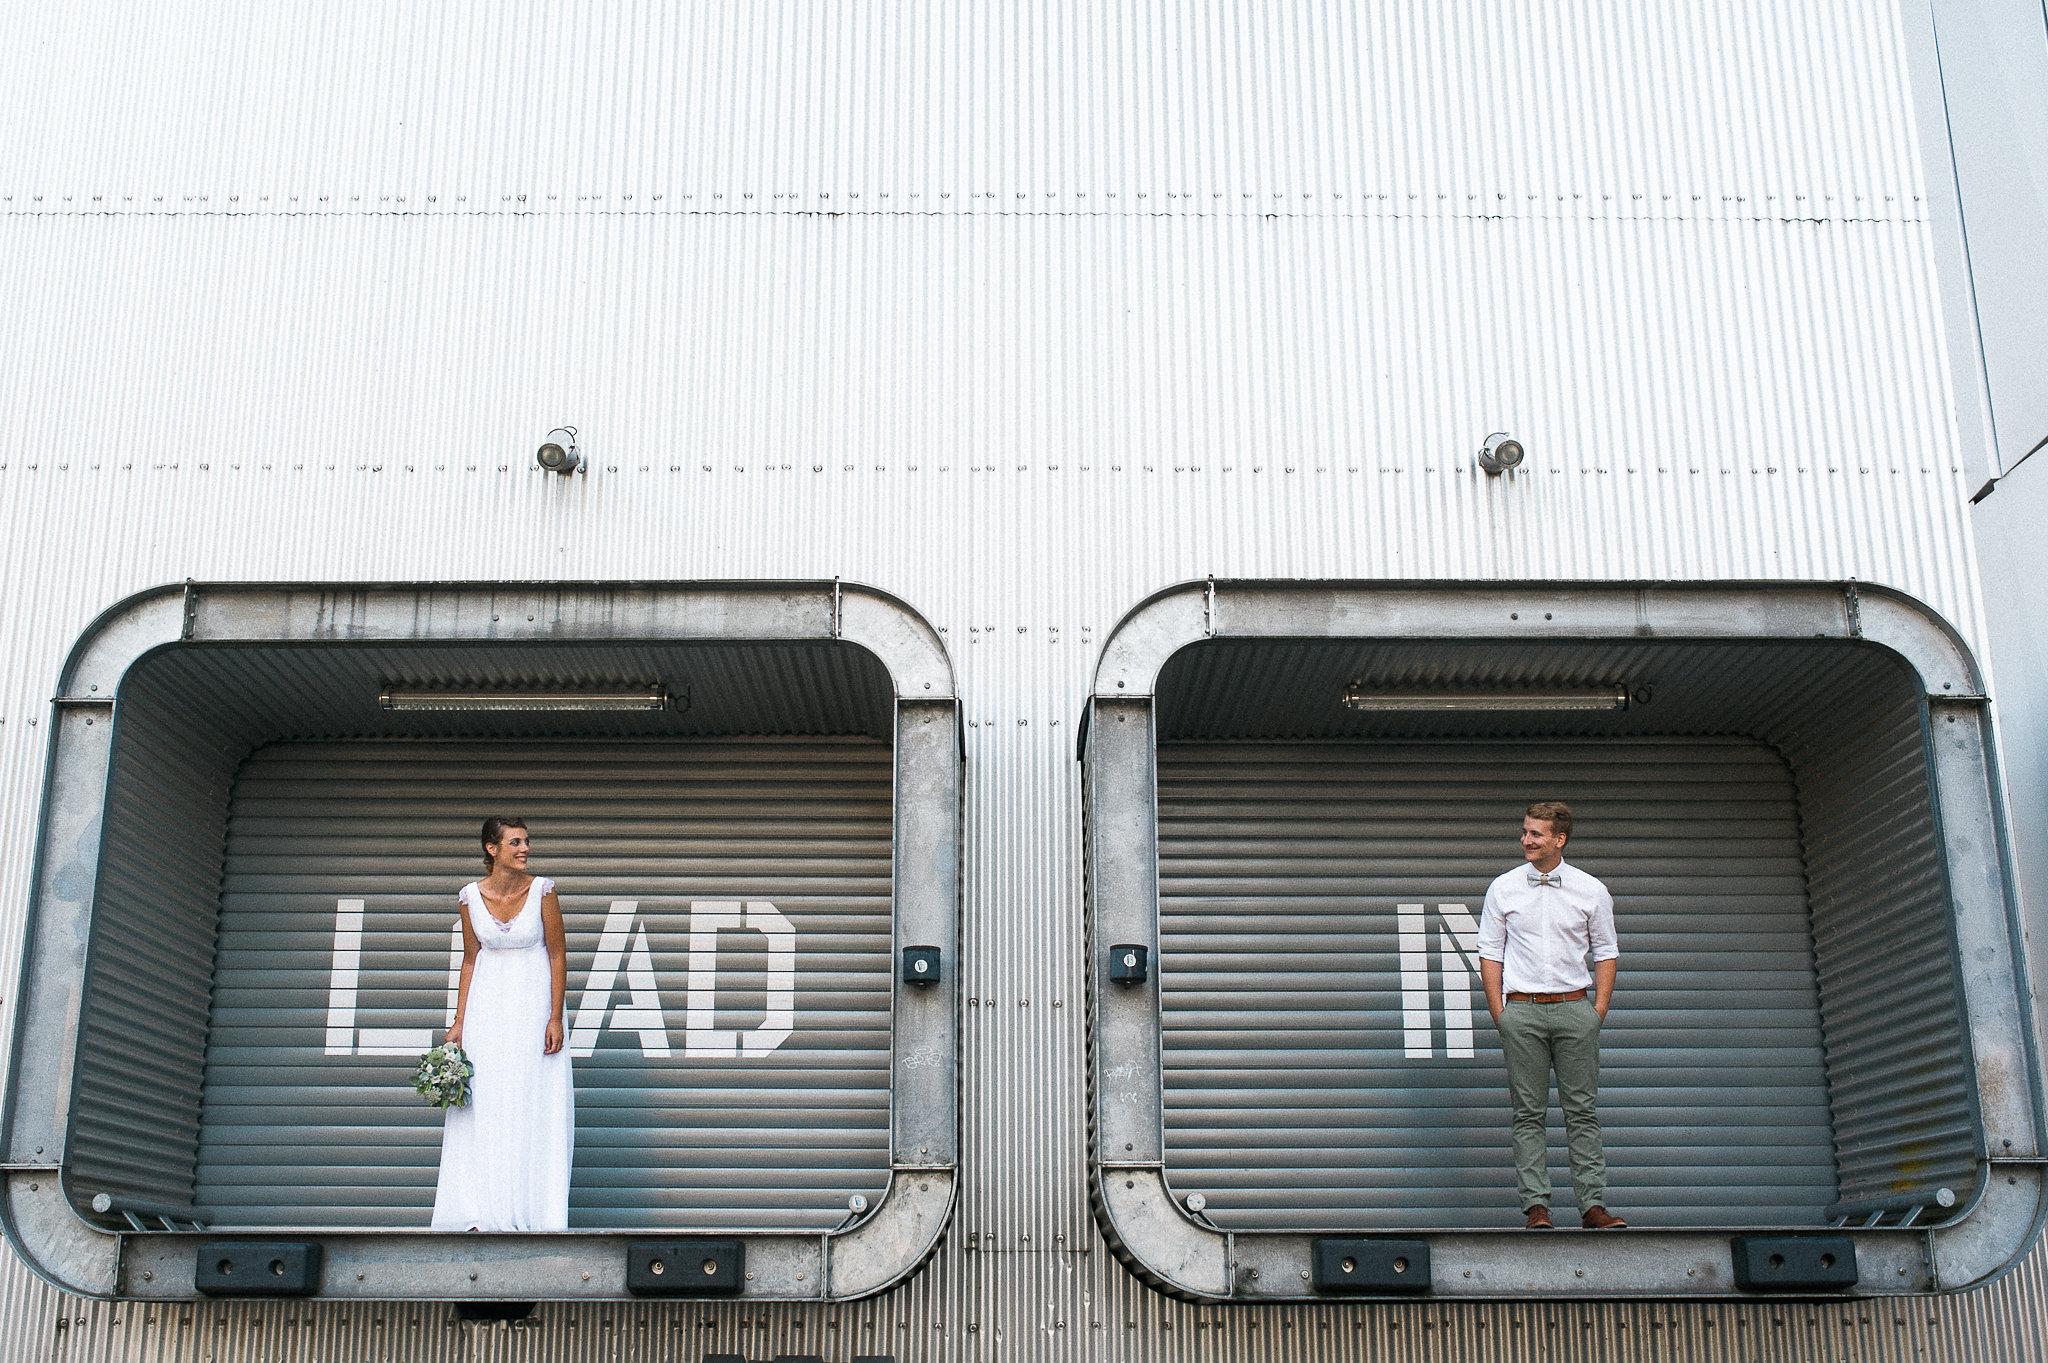 concours-funky-wedding-combi-volkswagen-vintage-crest-la-boheme (5)